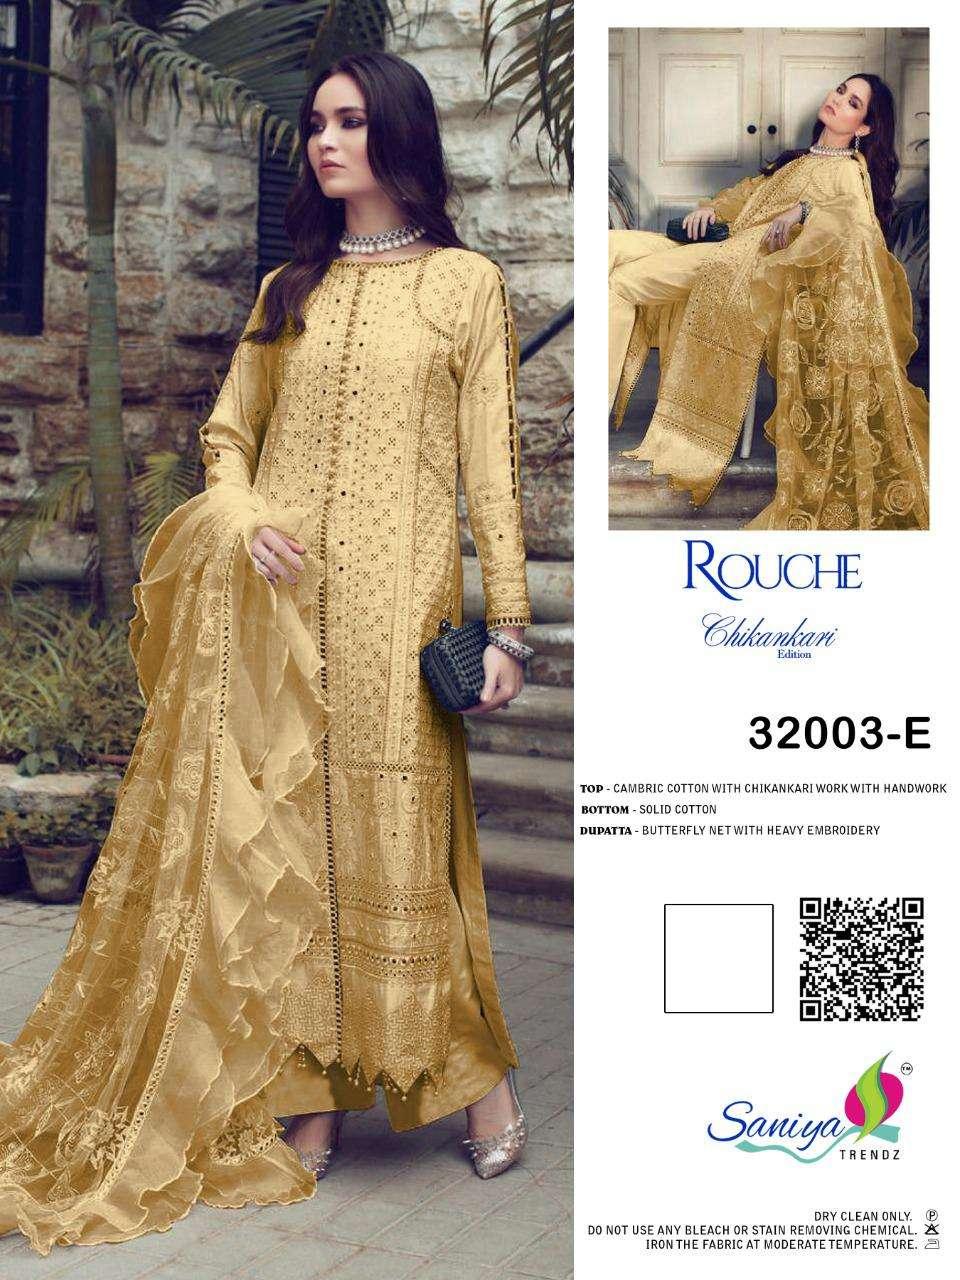 saniya rouch 32003 colours cambric cotton pakistani dresses